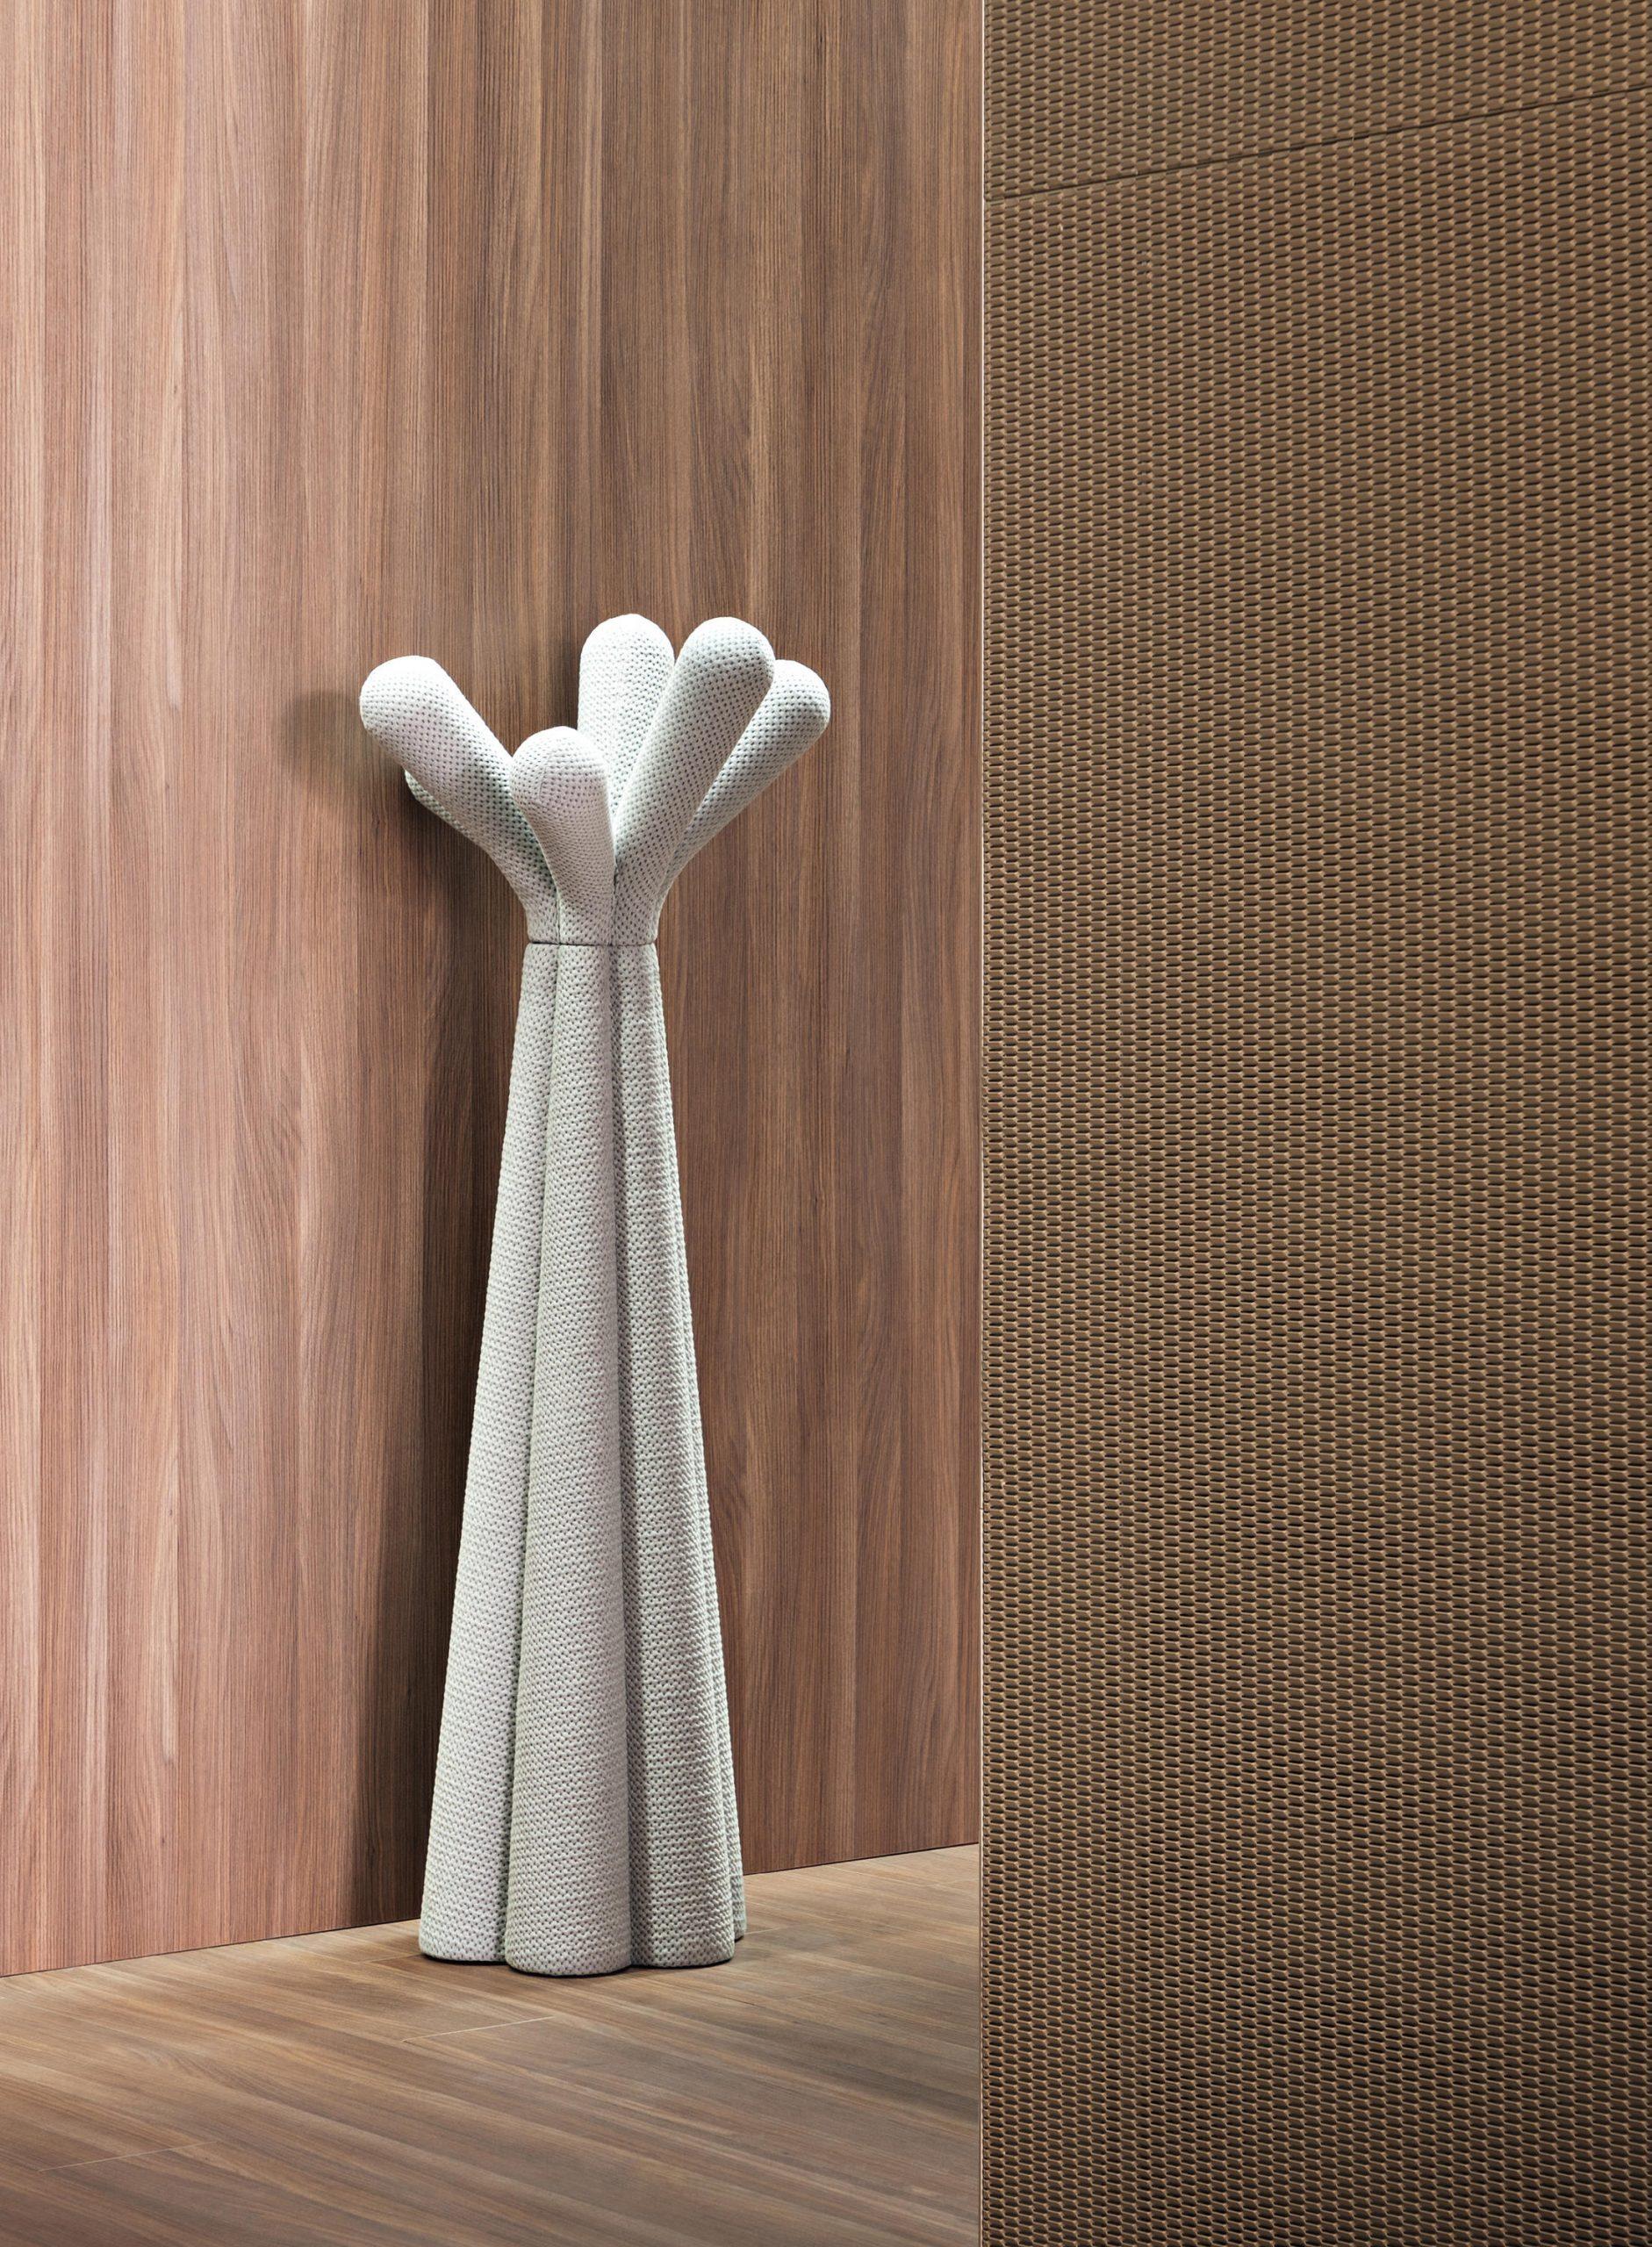 Anemone Coat Rack by Fabrice Berrux for Bonaldo